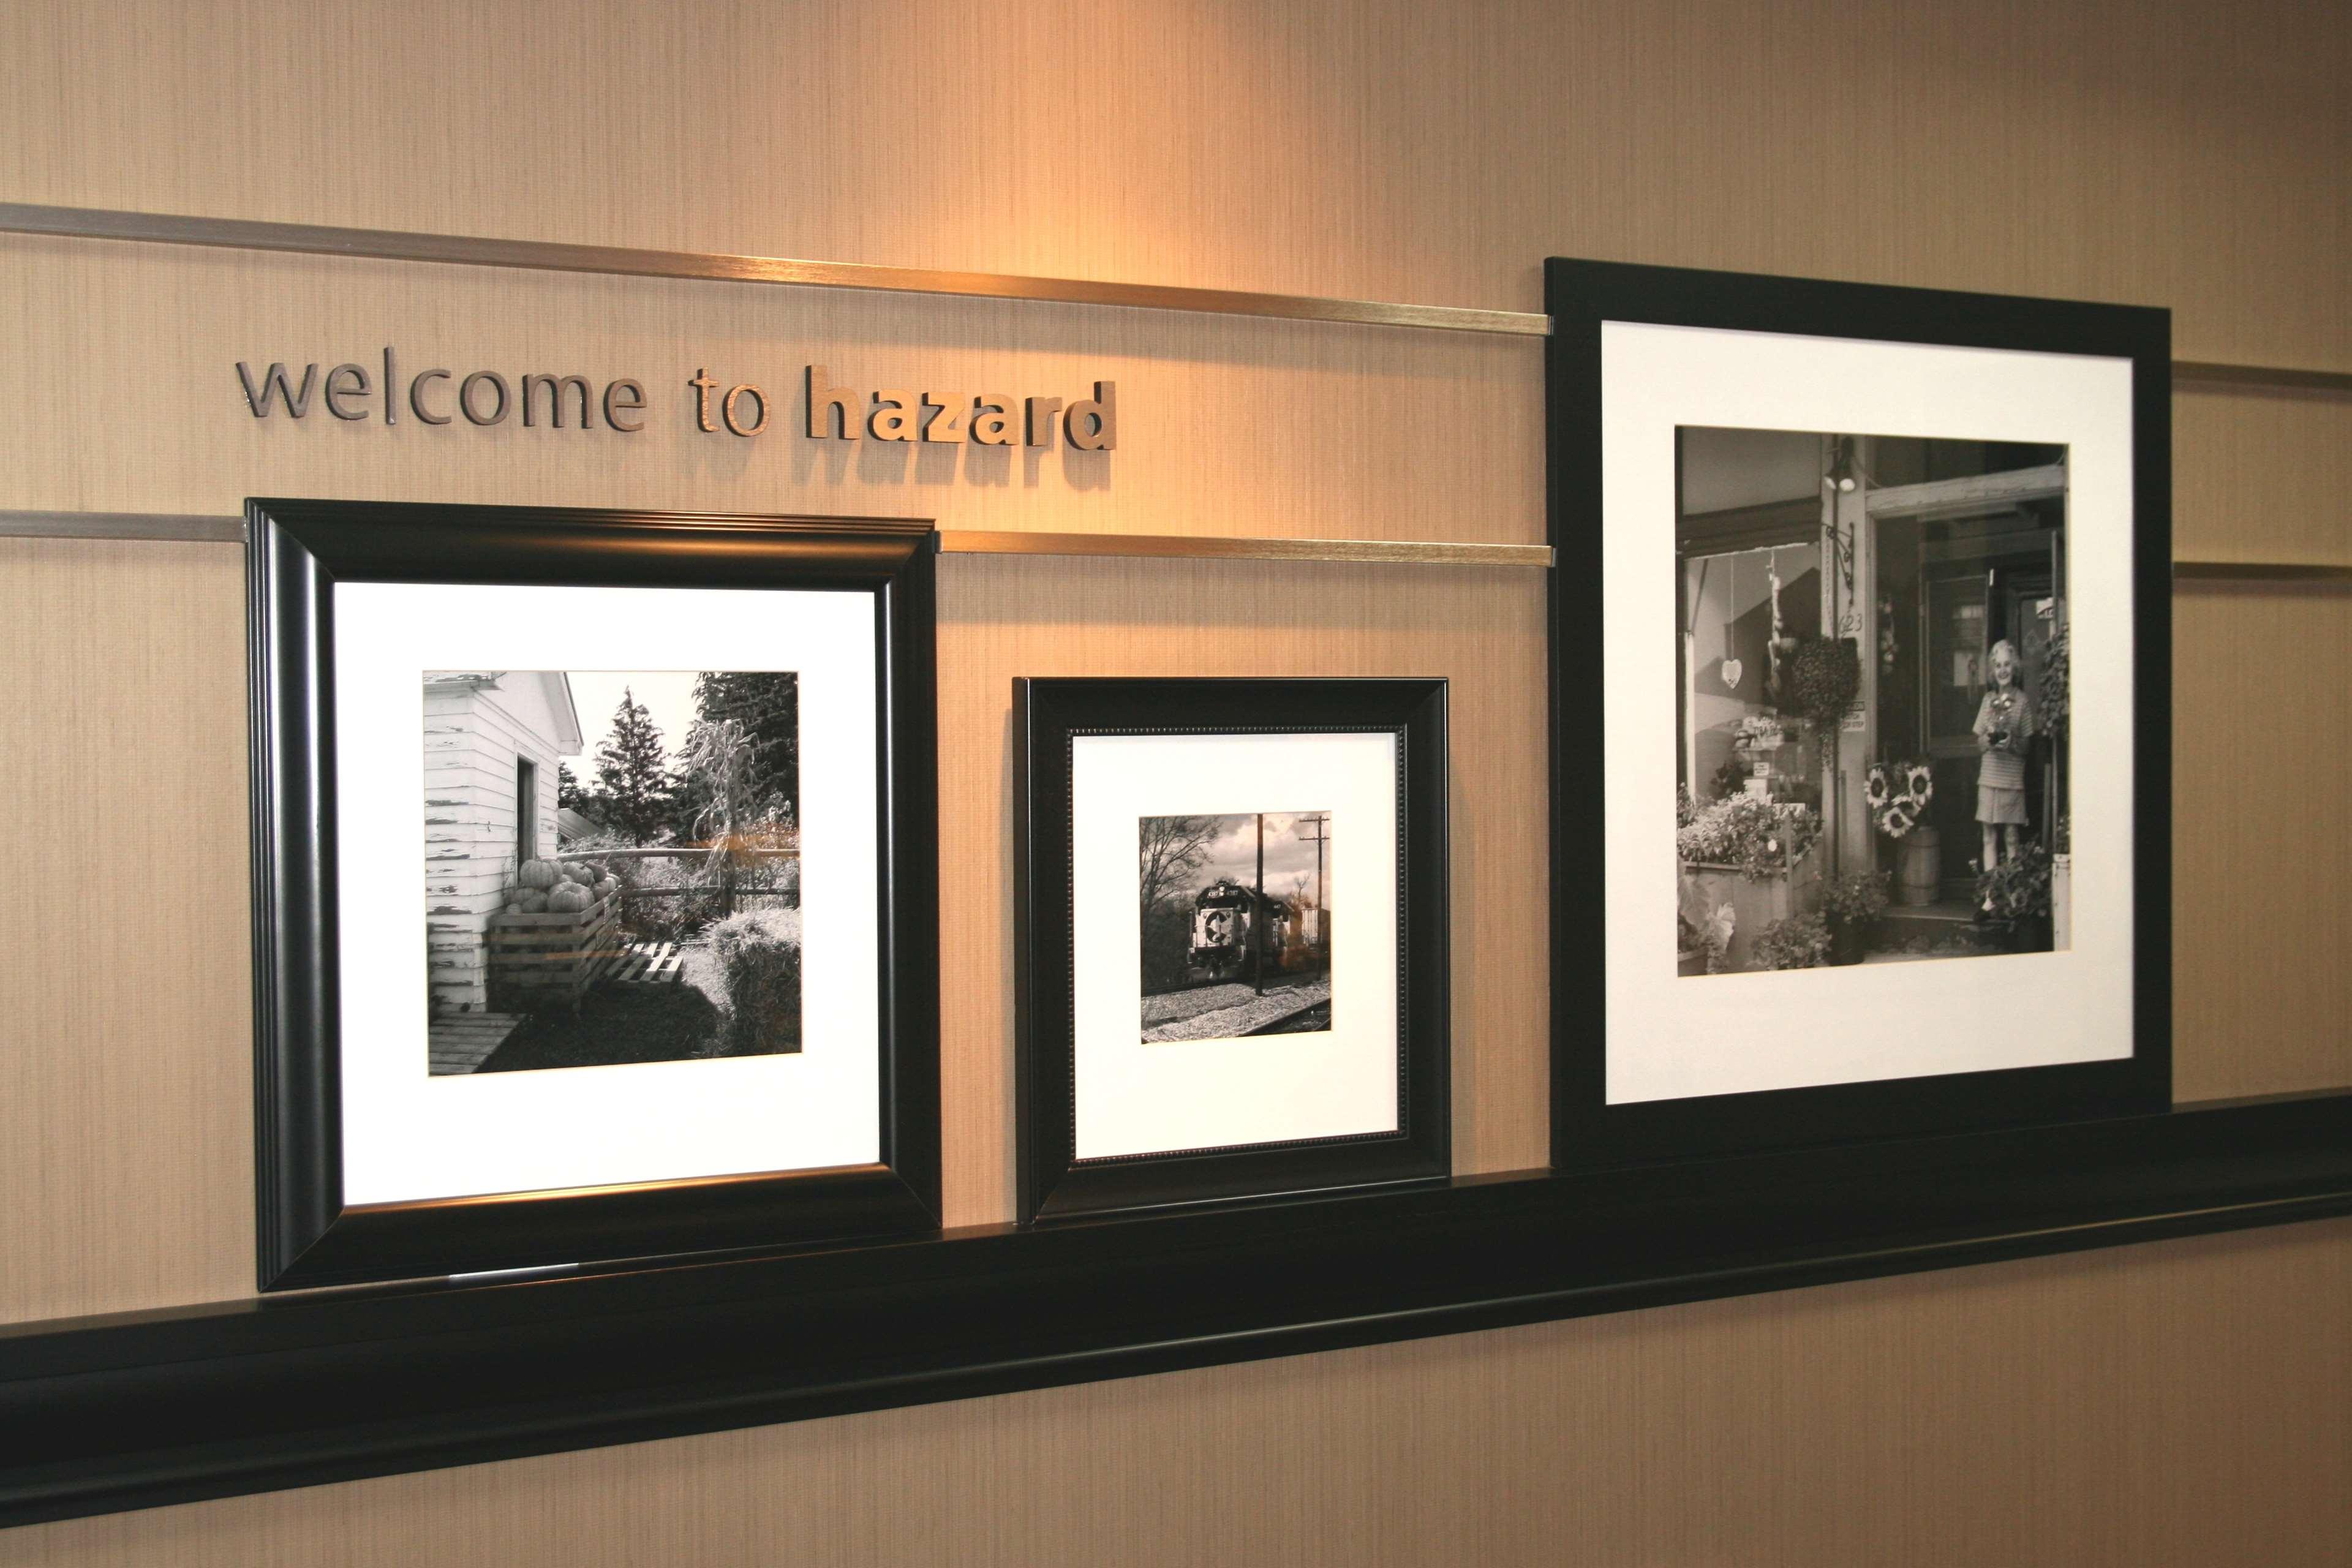 Hampton Inn & Suites Hazard image 1